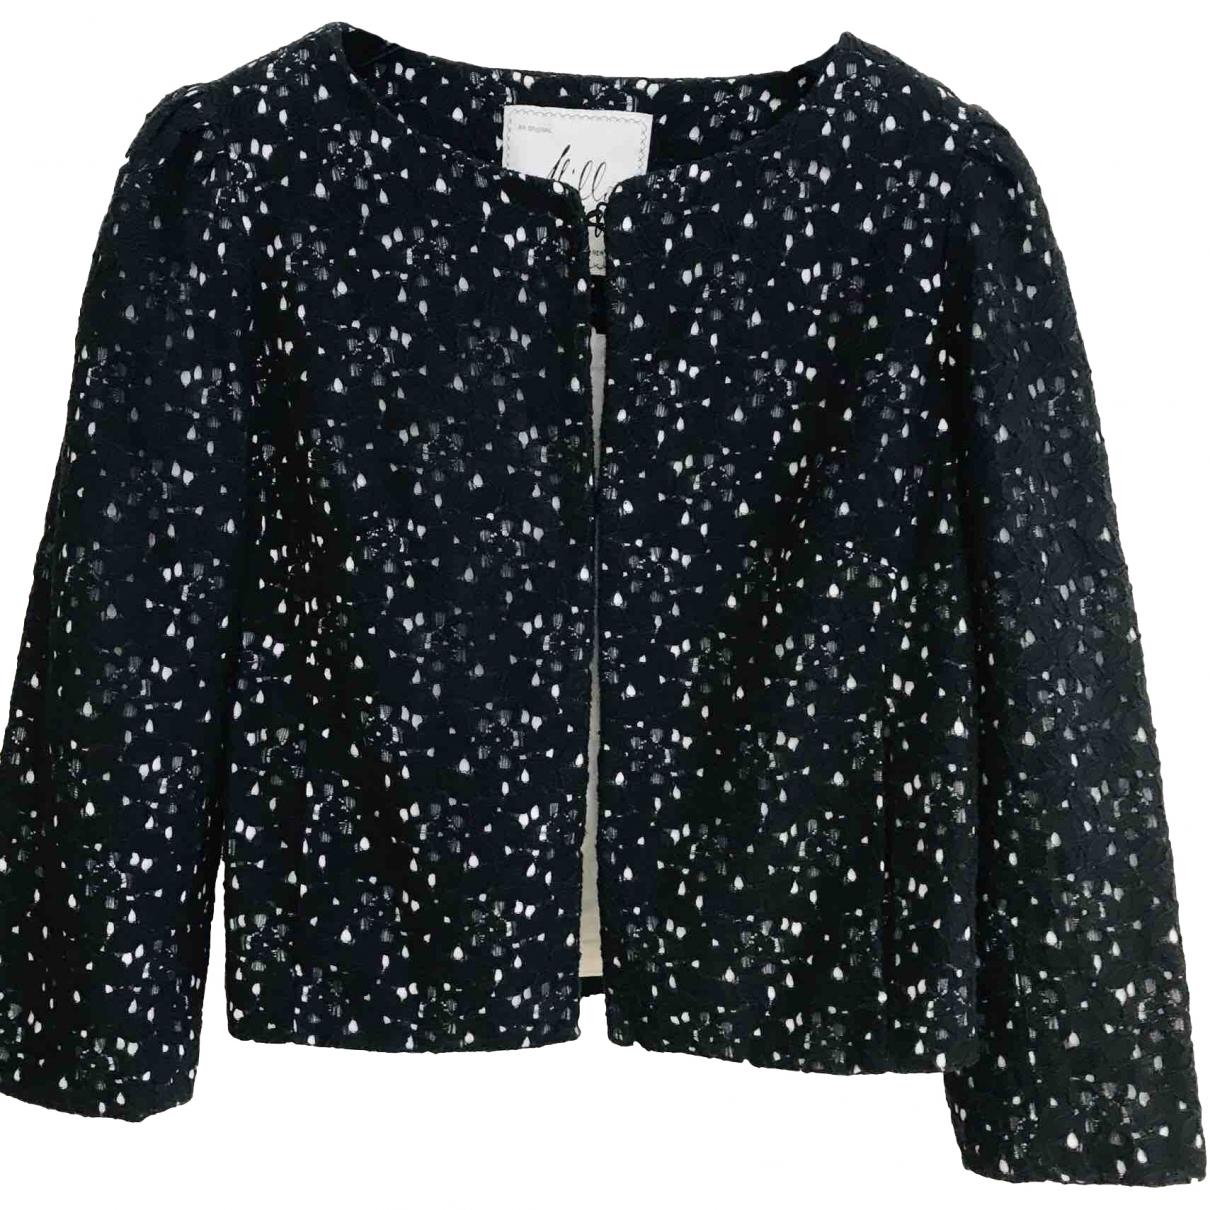 Milly \N Black Cotton jacket for Women 6 UK